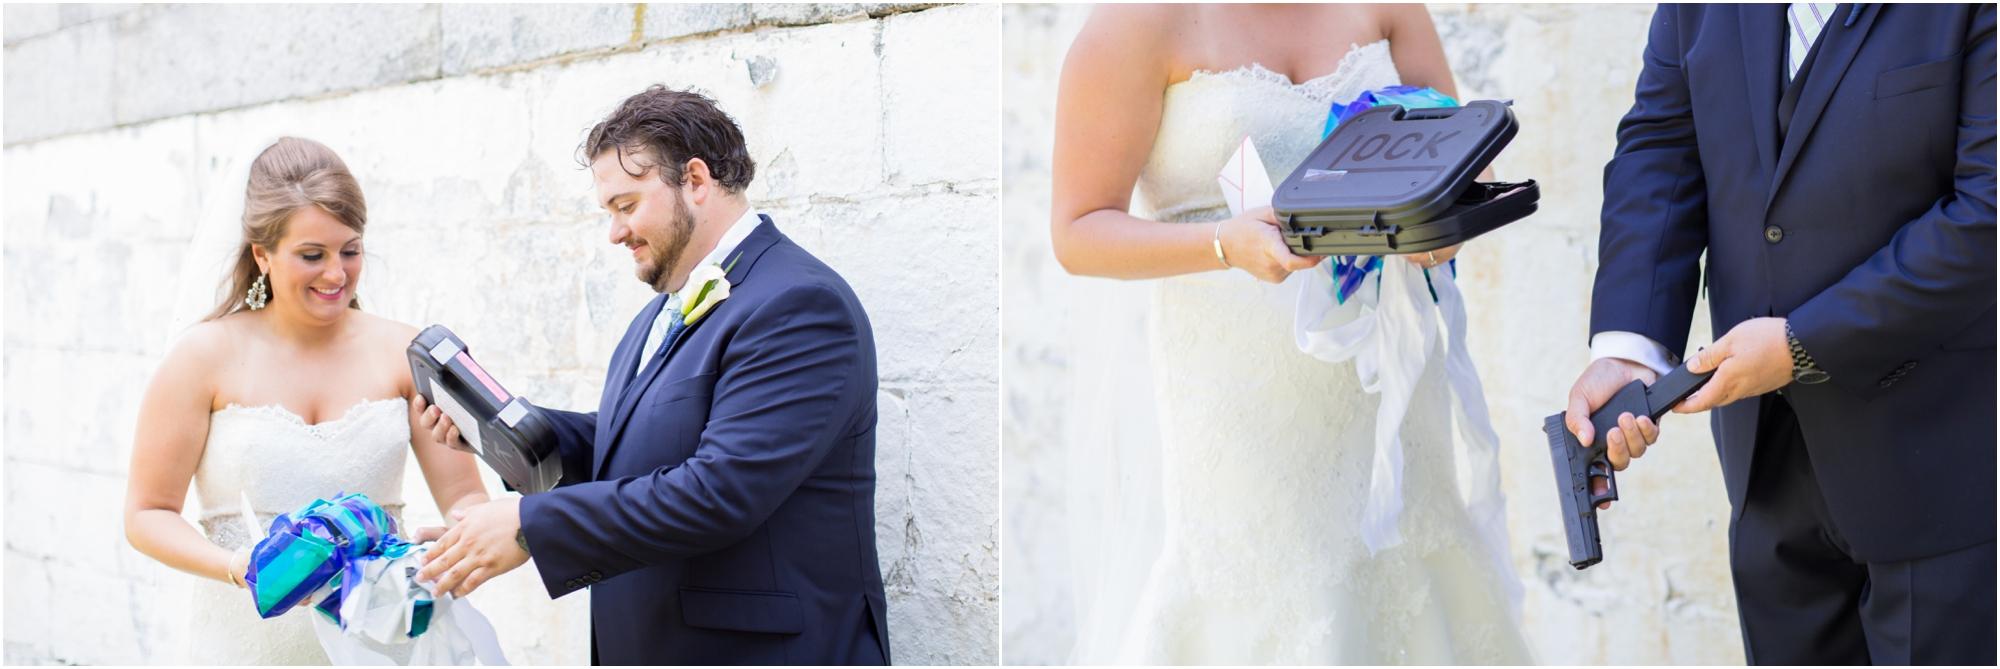 3-Barto Wedding Bride & Groom Portraits-326.jpg